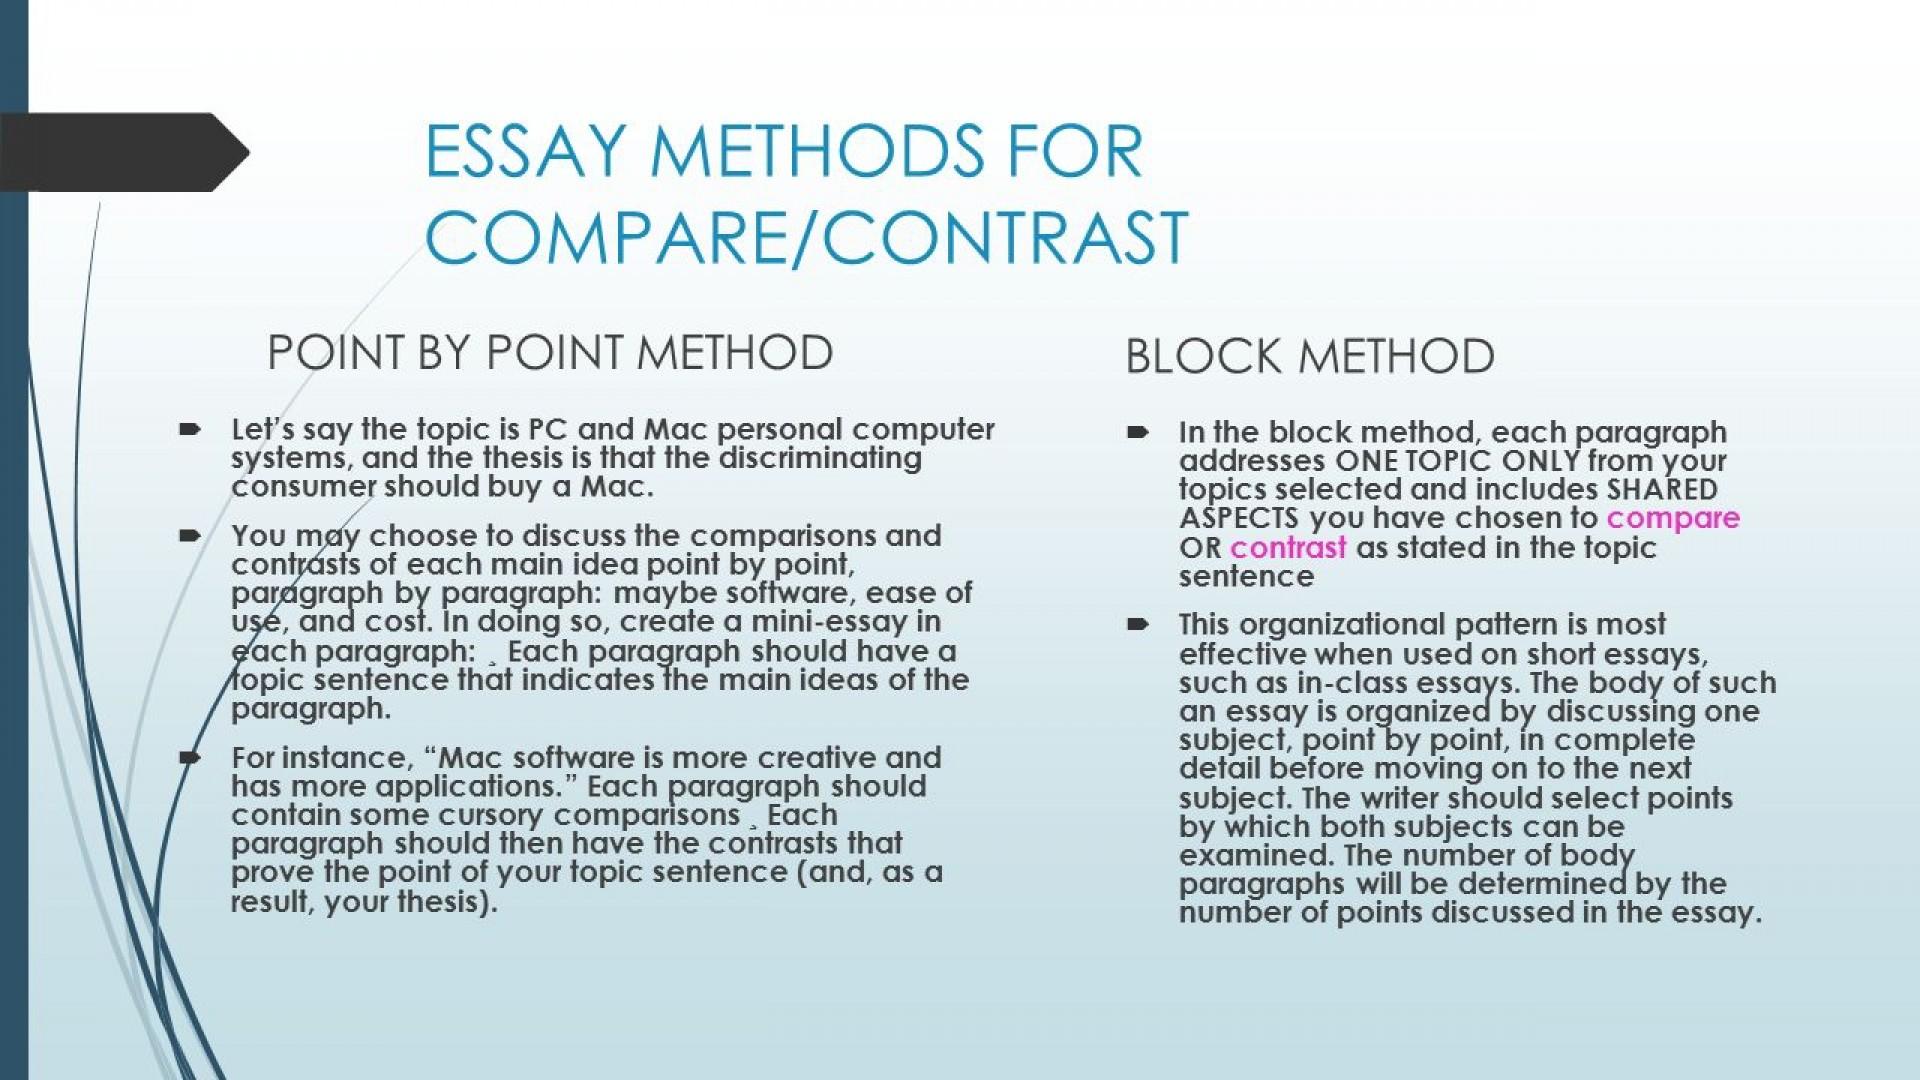 001 Essay Example Compare And Contrasting Contrast Point By Writing Method In Kannada Sli Methods Models Methodology Sample Pdf Urdu Hindi Methodologie Ielts Wonderful Outline 1920